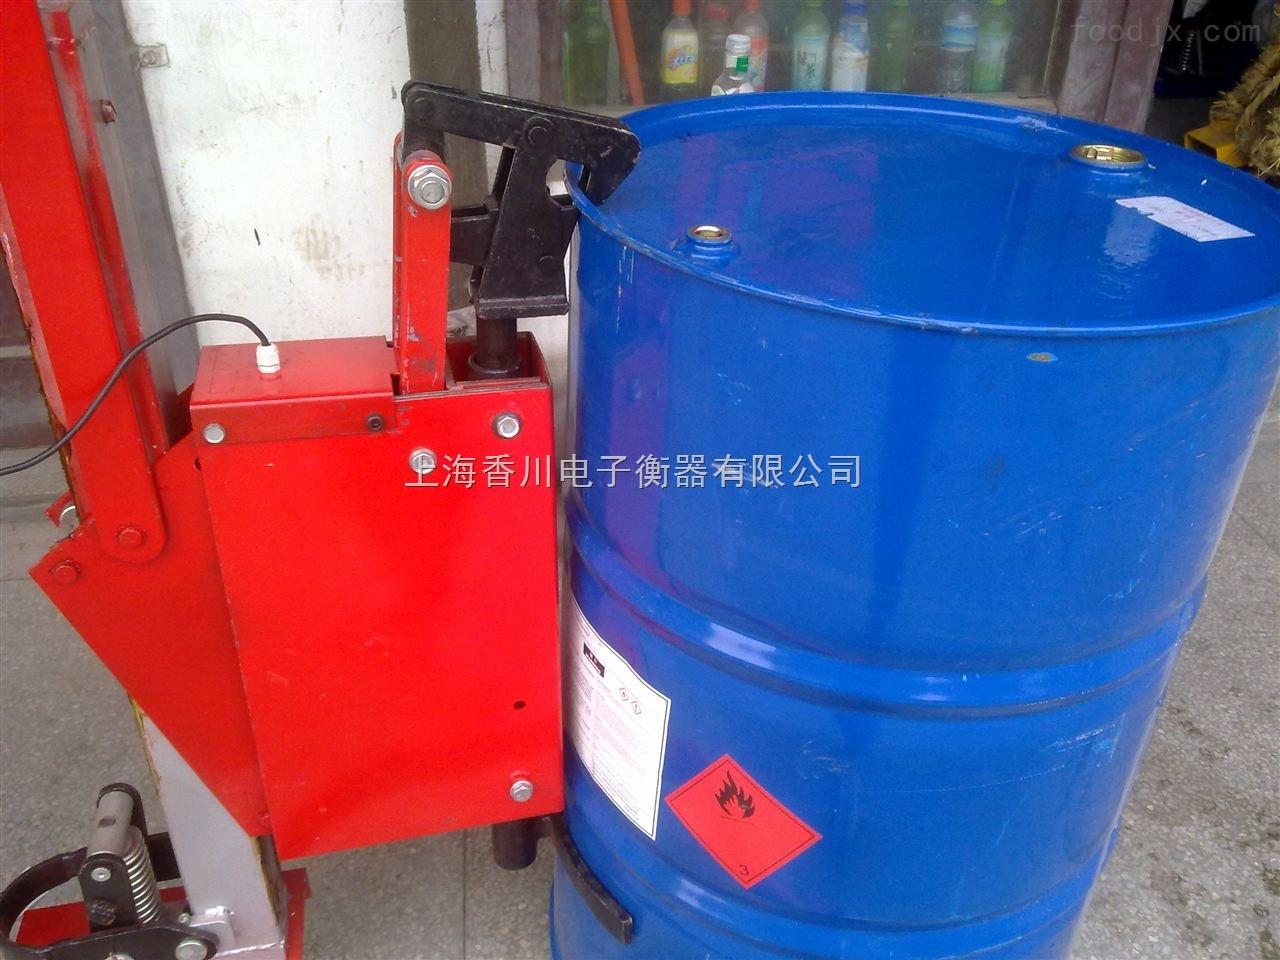 DCS-XC防爆油桶秤,油桶秤,電動防爆油桶地磅秤油漆秤